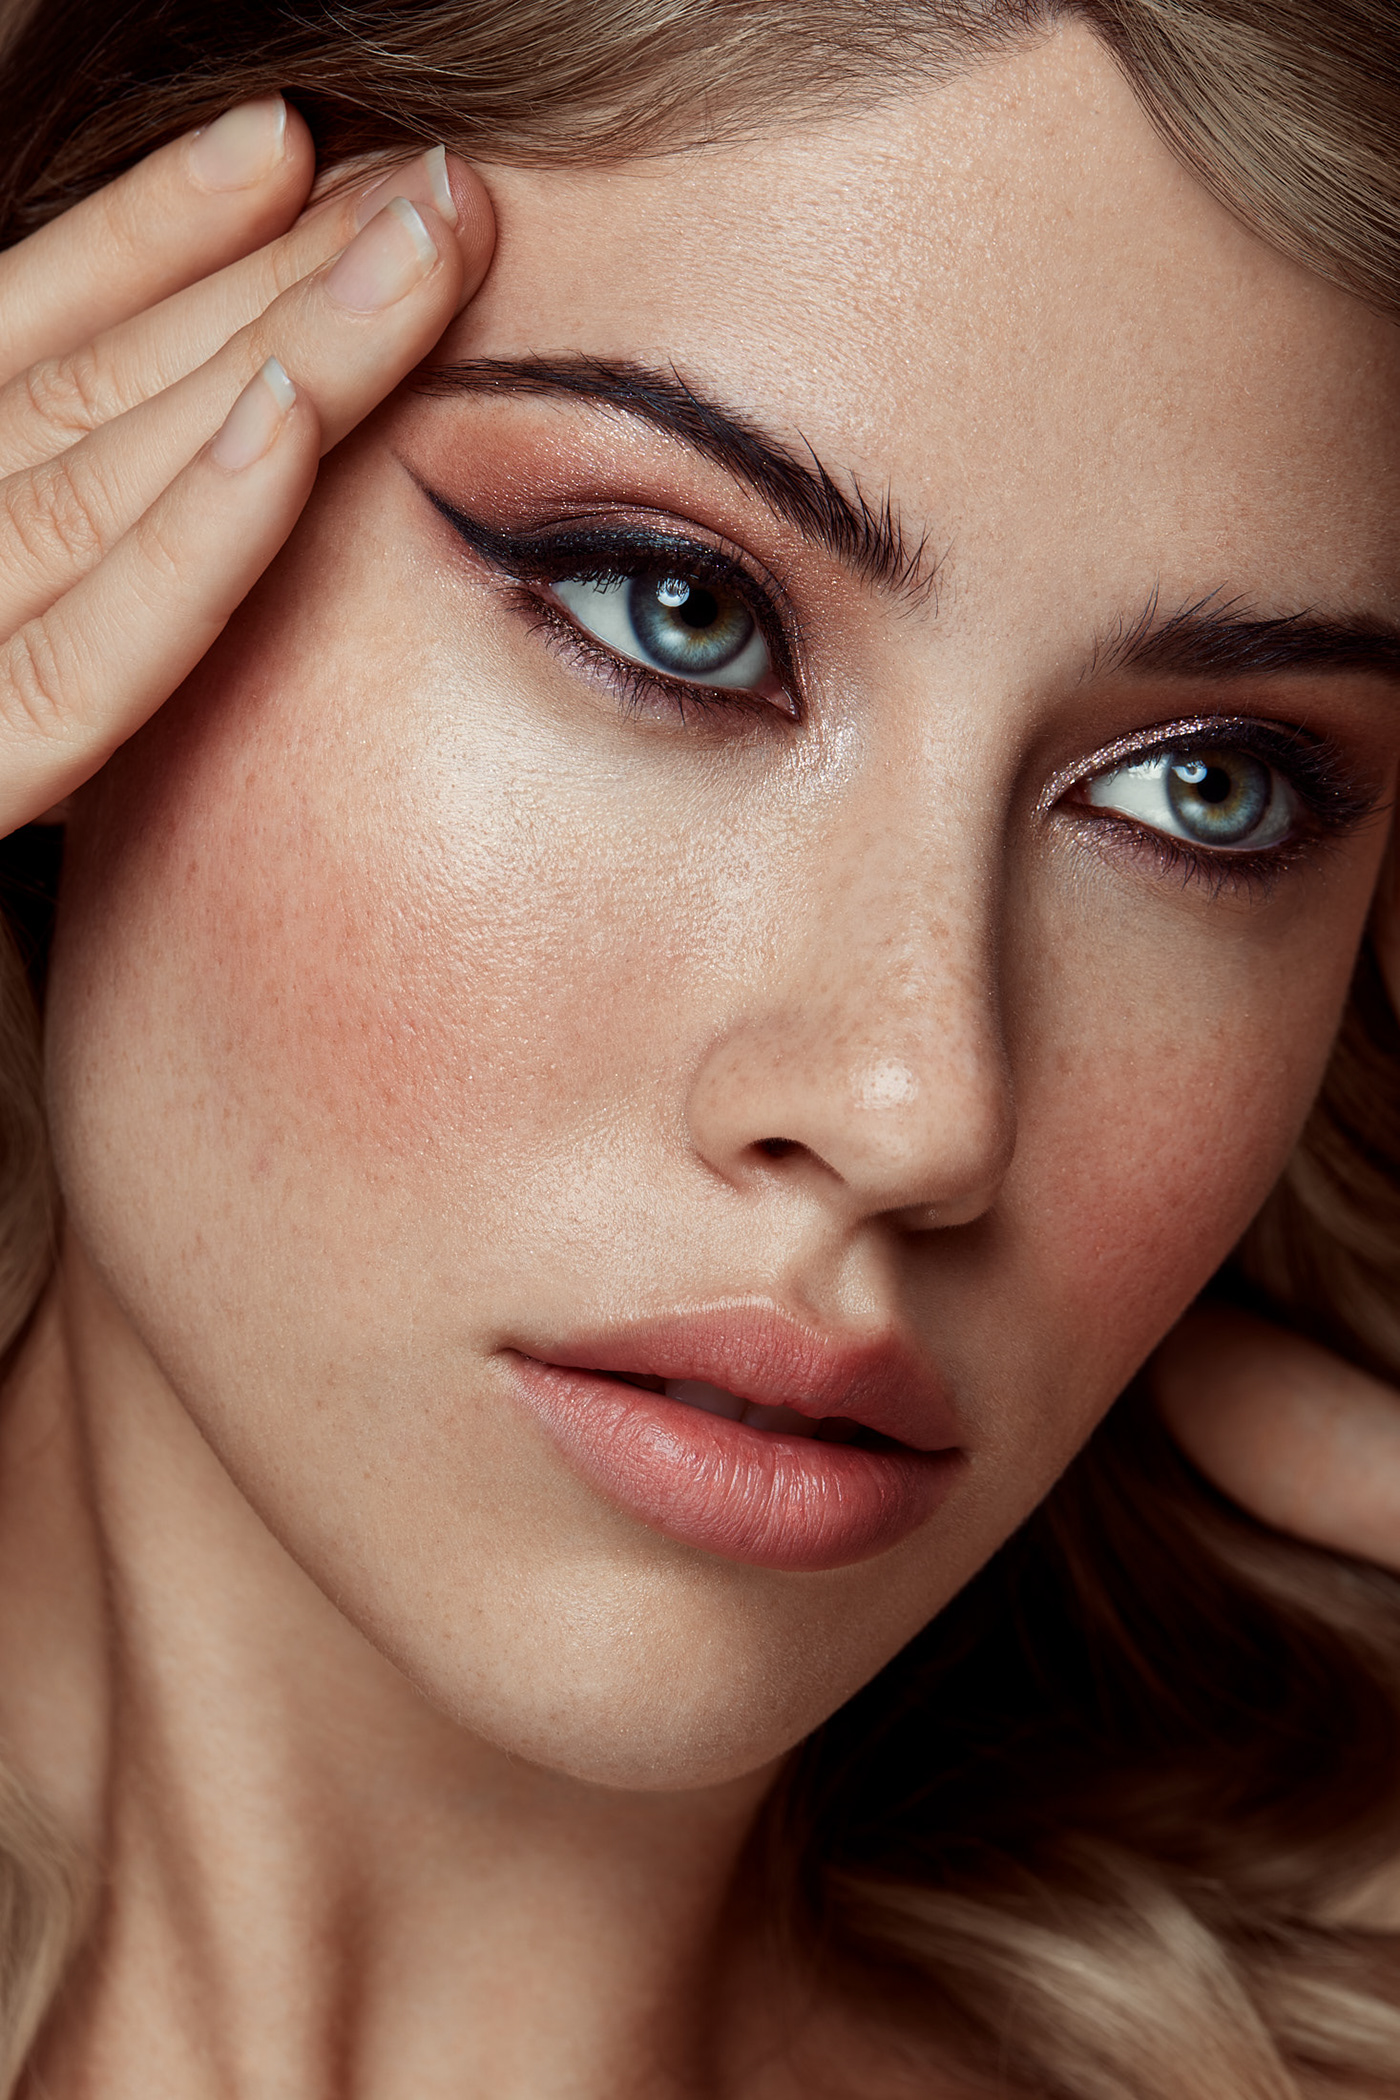 Beauty Model beauty photography close up beauty cosmetics photography macro macro beauty makeup